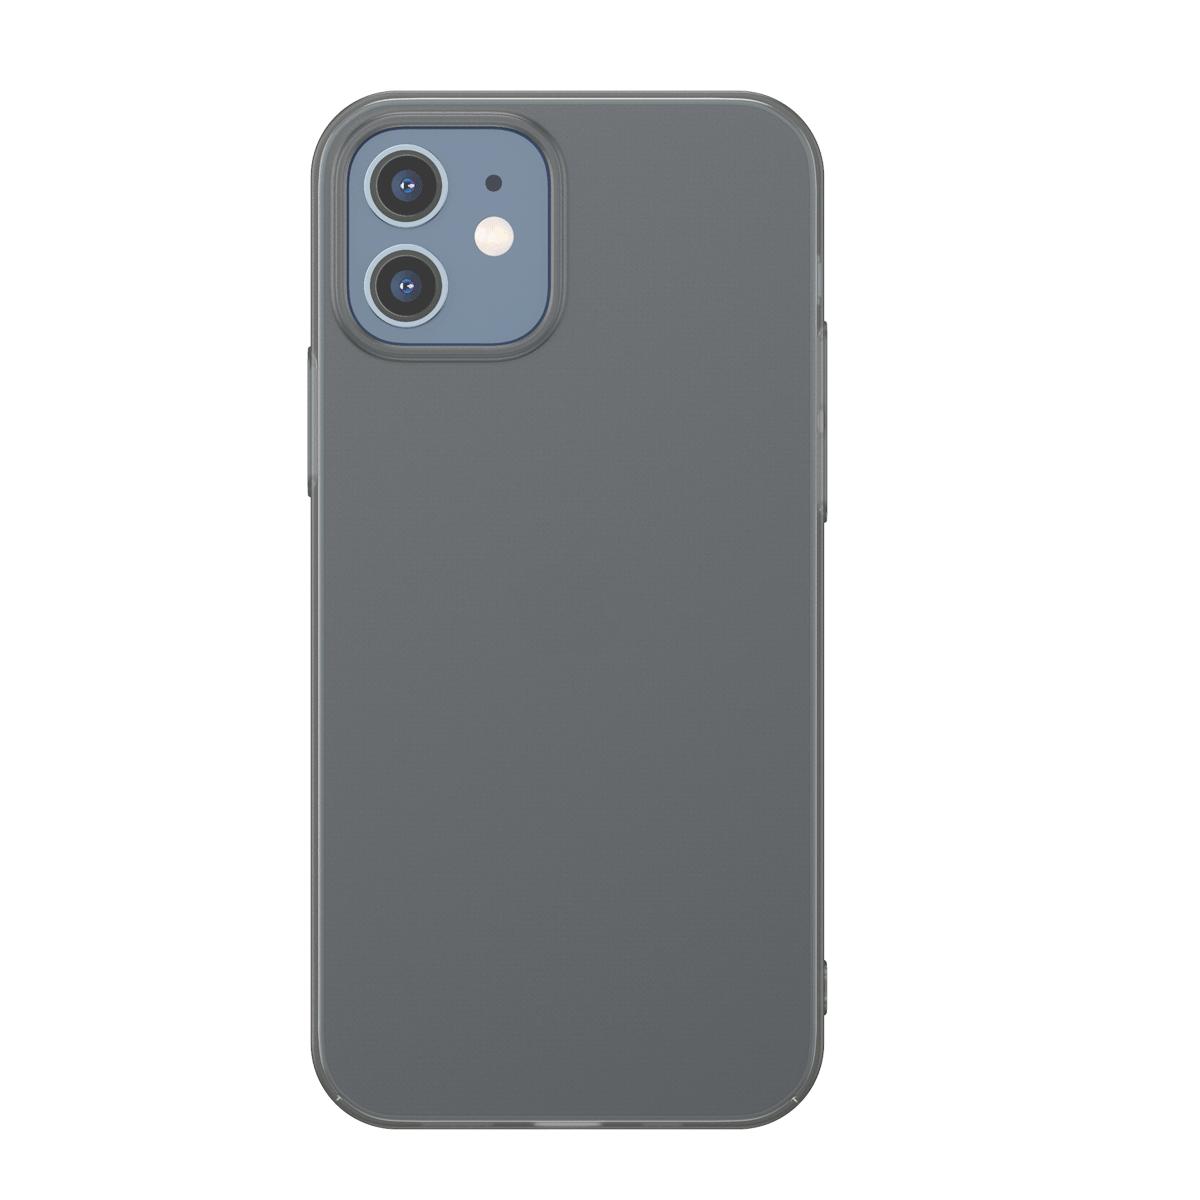 Husa Apple iPhone 12 Mini, Baseus Comfort Case, Negru, 5.4 inch imagine